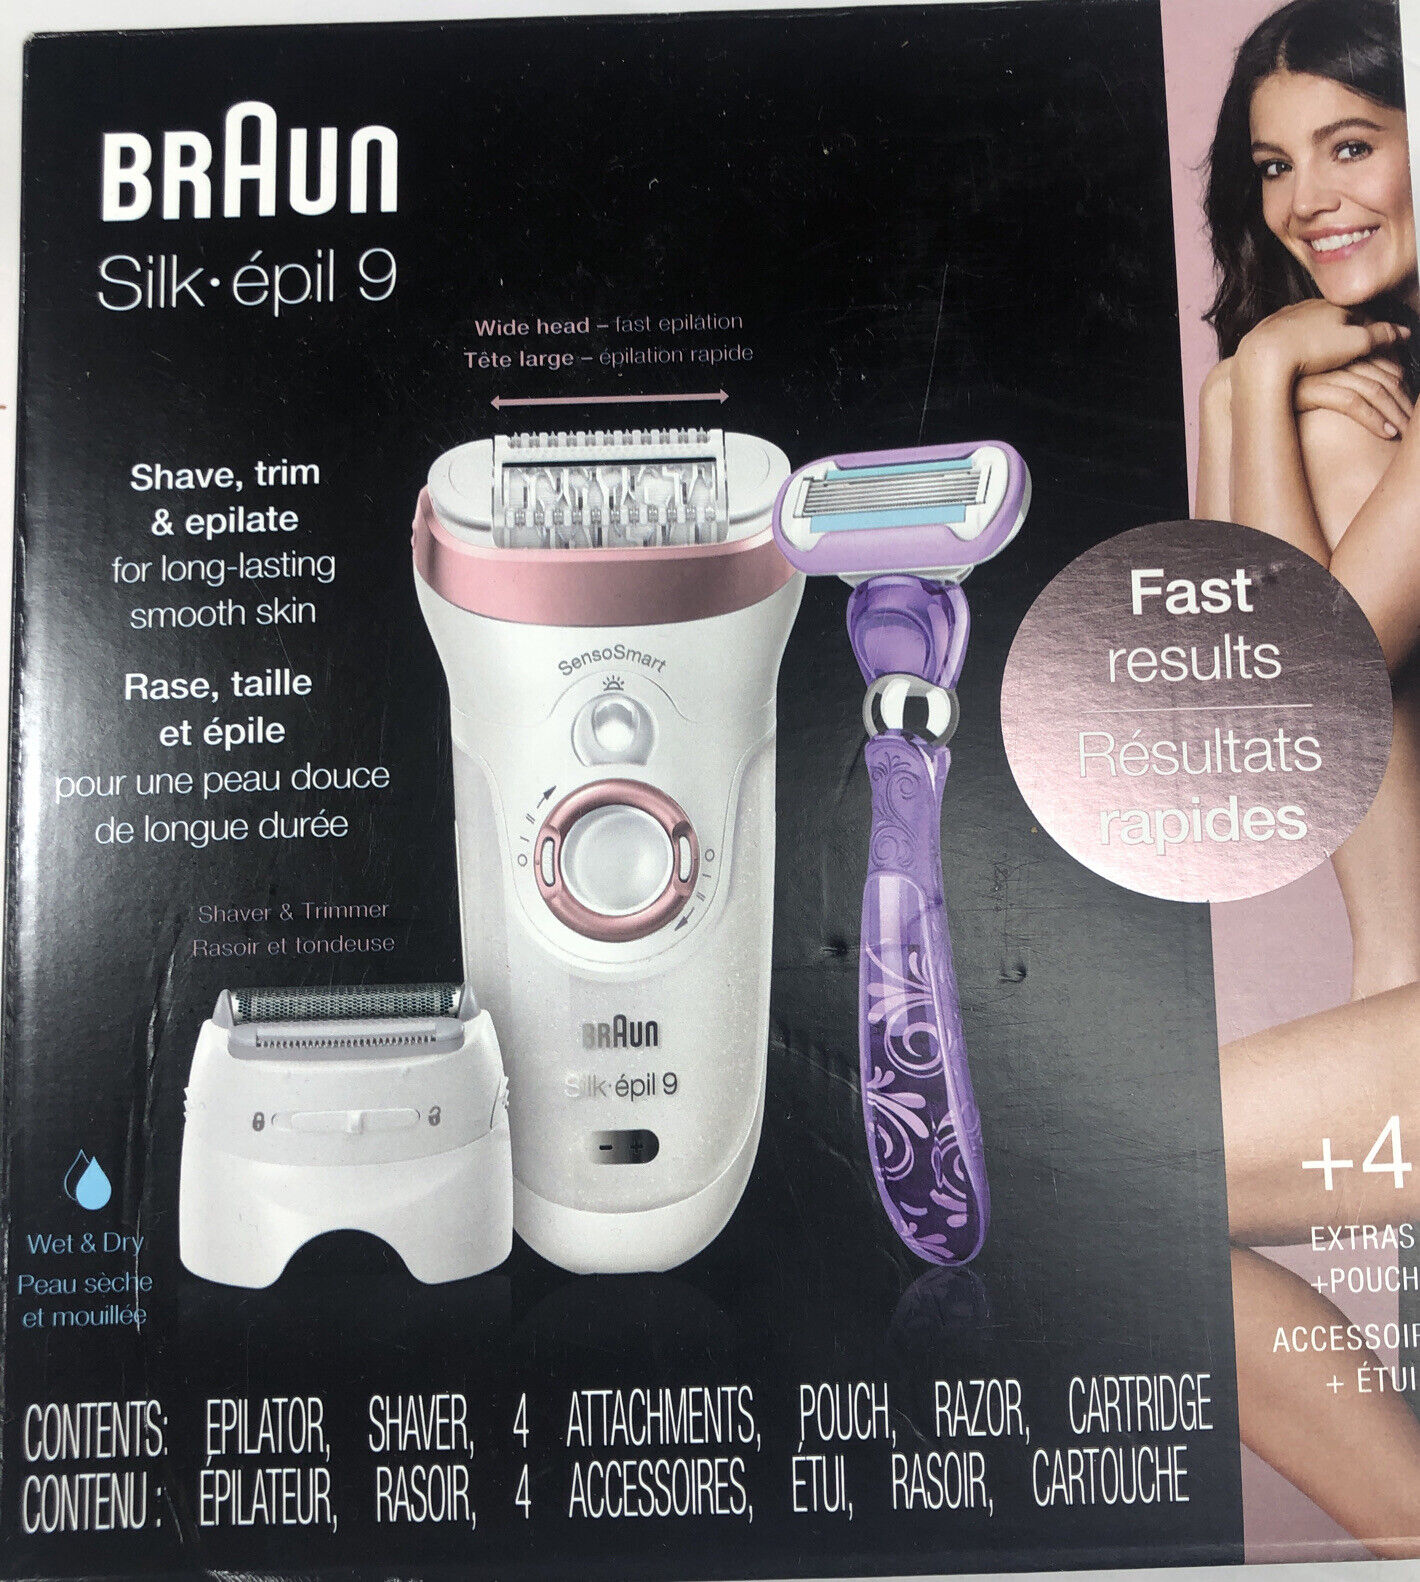 Braun Silk épil 9 Sensosmart 9 870 Wet Dry Epilator For Sale Online Ebay